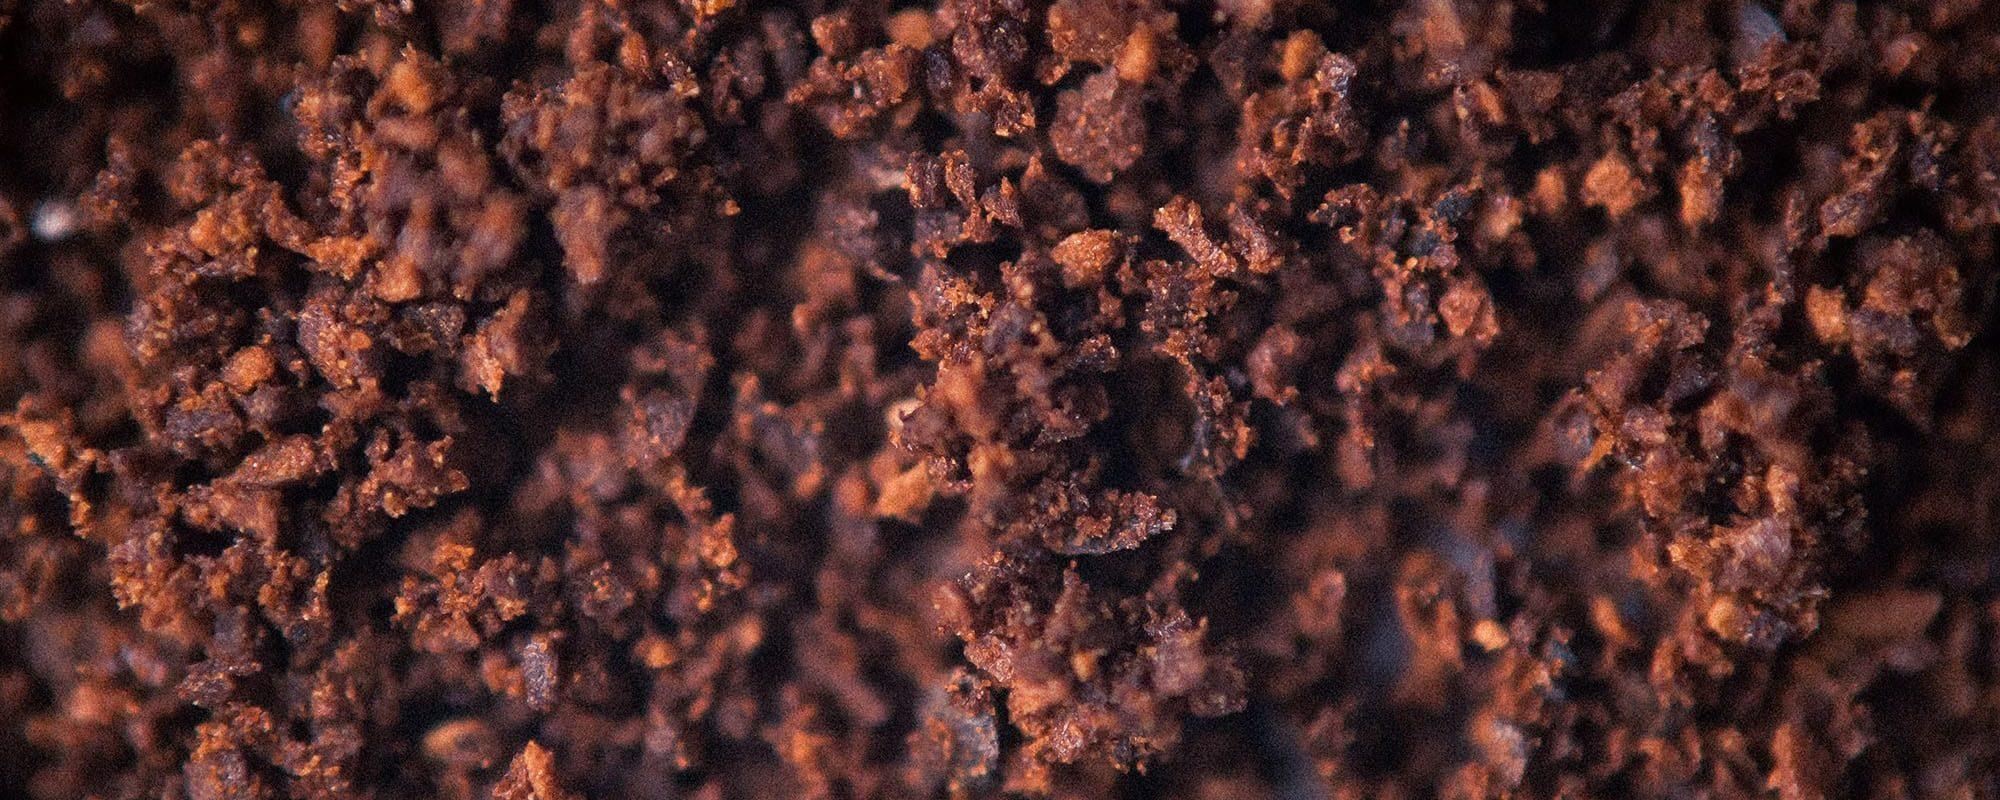 Handy Germain - Traitement Termites - Pays Basque - Landes - Par Klim Sergeev